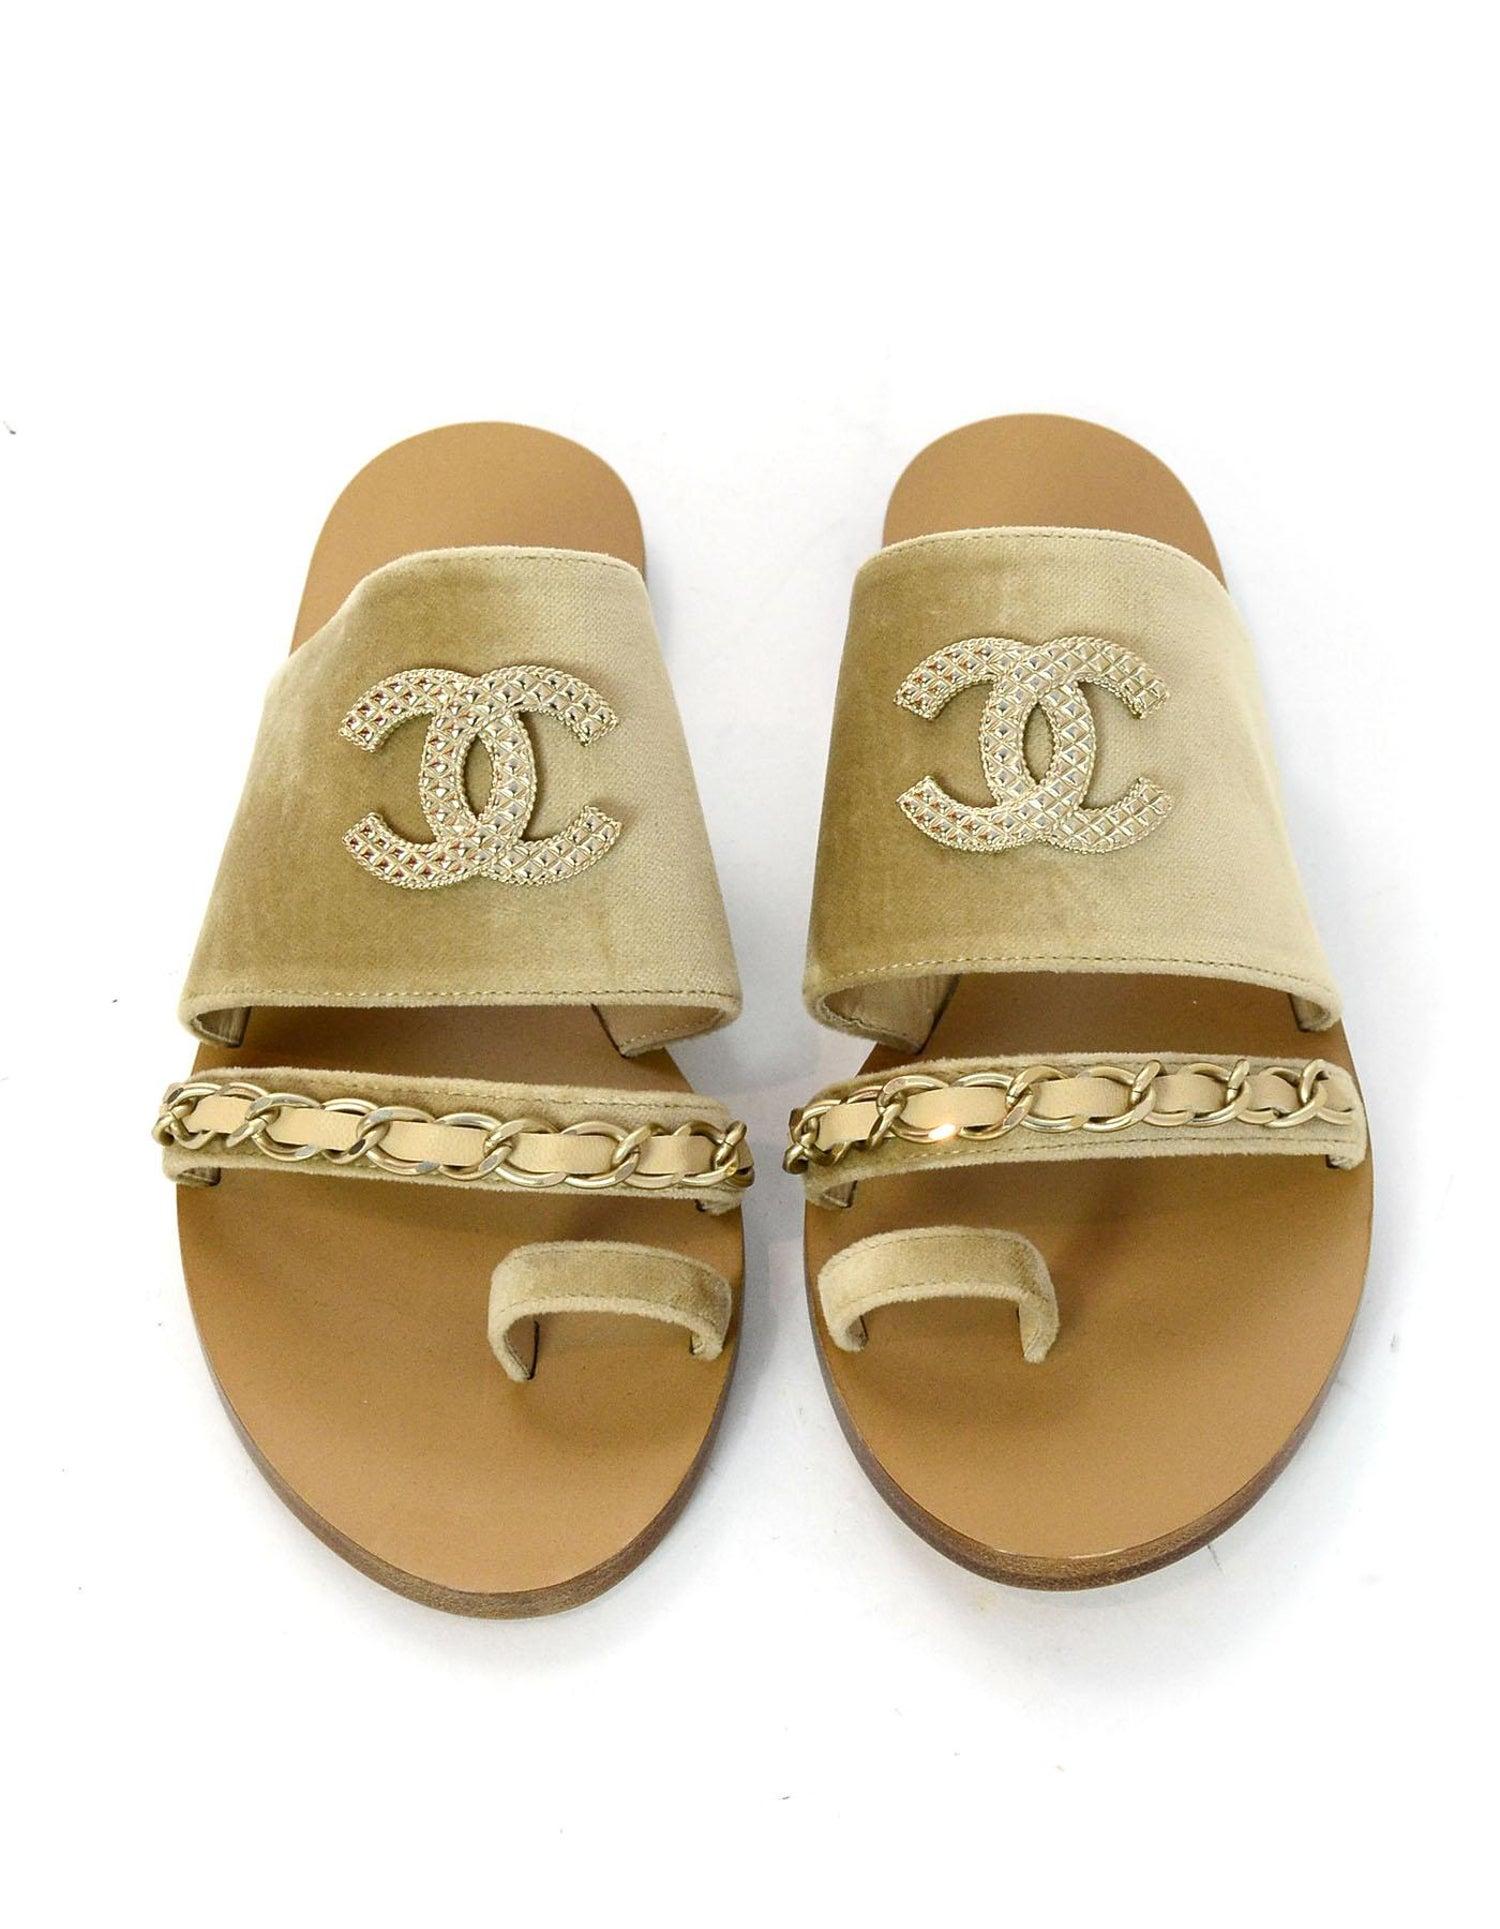 e542297cea40 Chanel 18C Beige Tan Velvet CC Chain Goldtone Sandals Sz 38 For Sale at  1stdibs